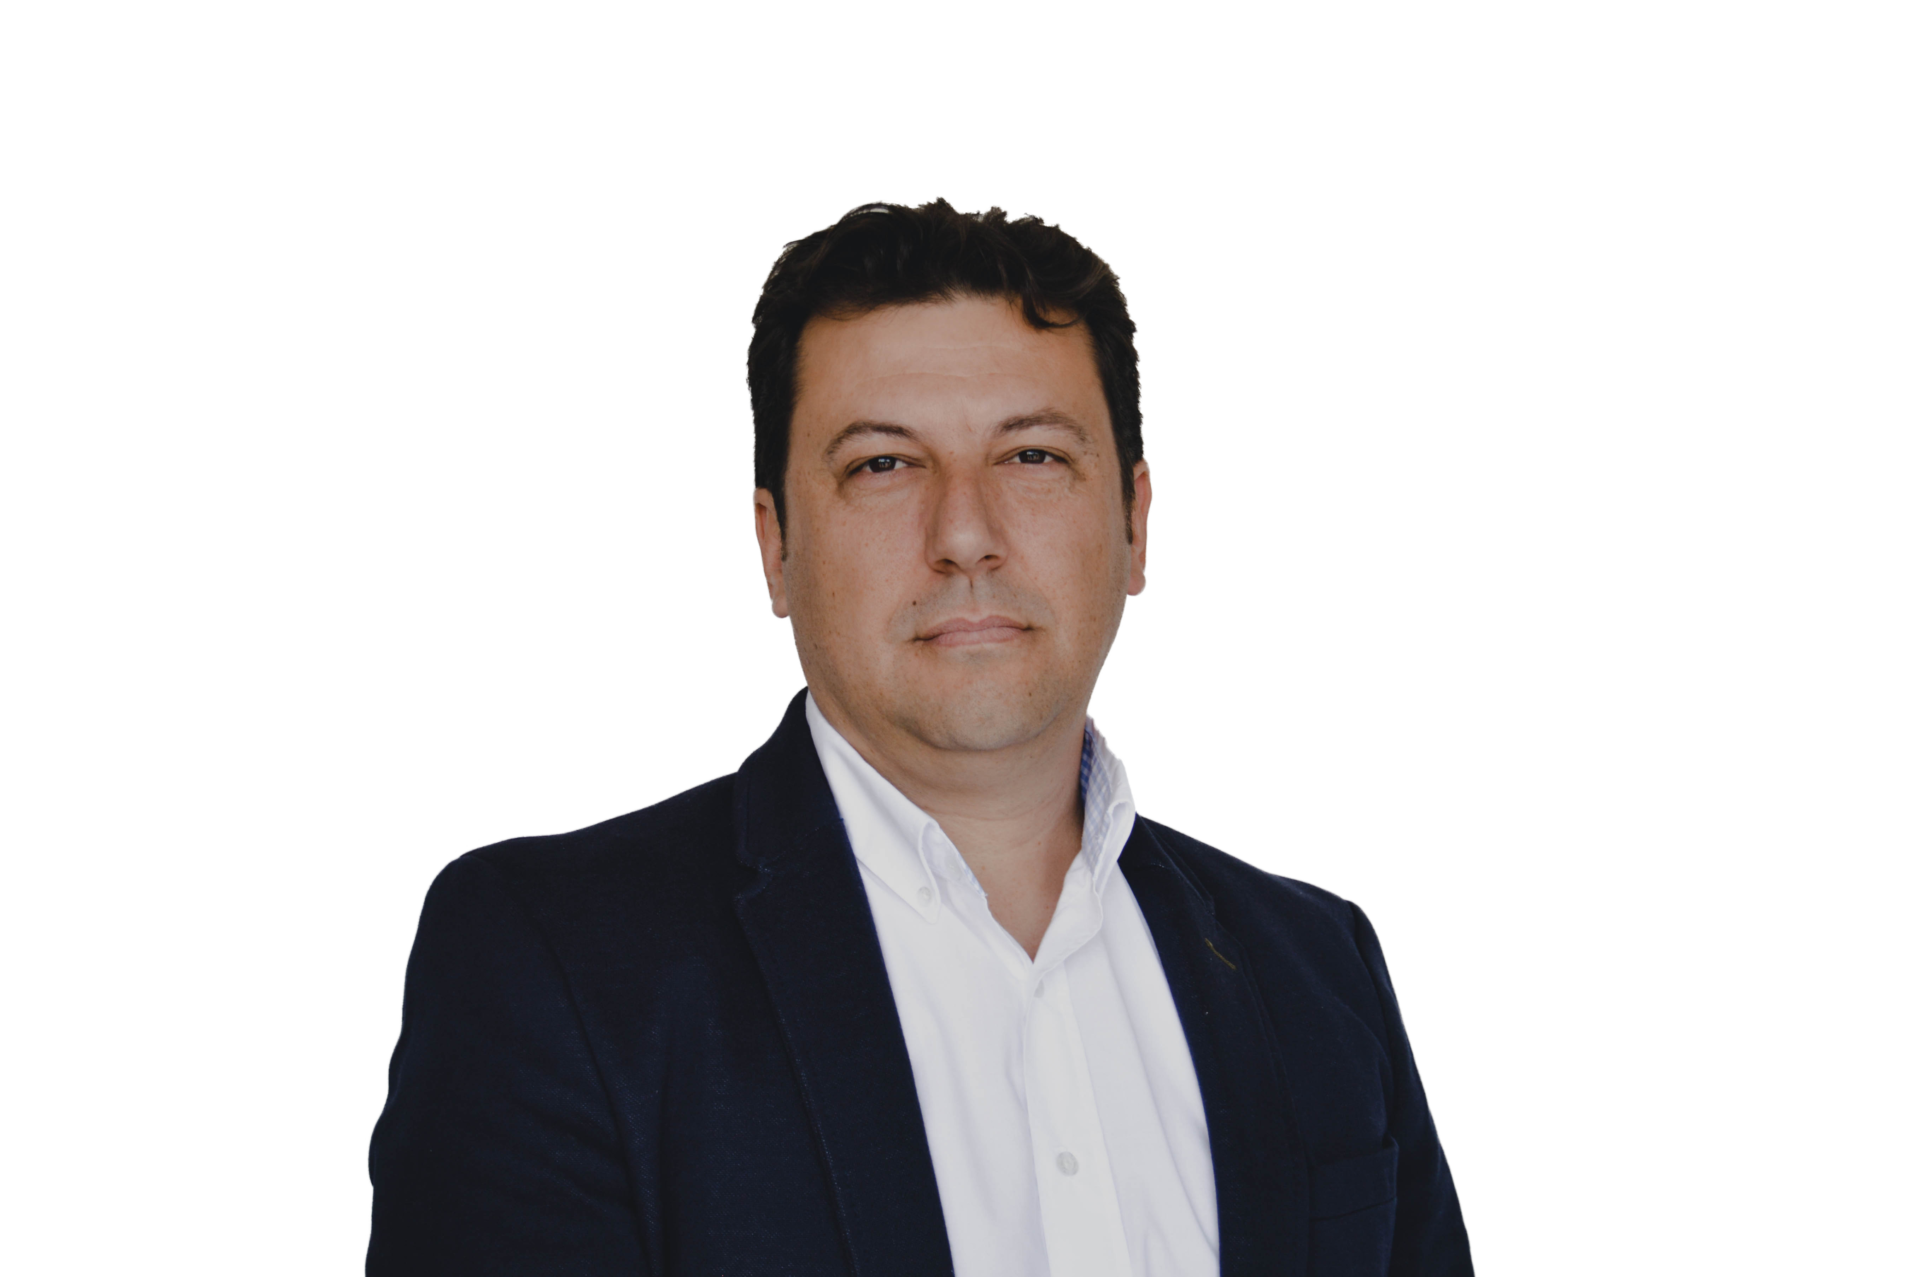 David Liviano Gonzalez